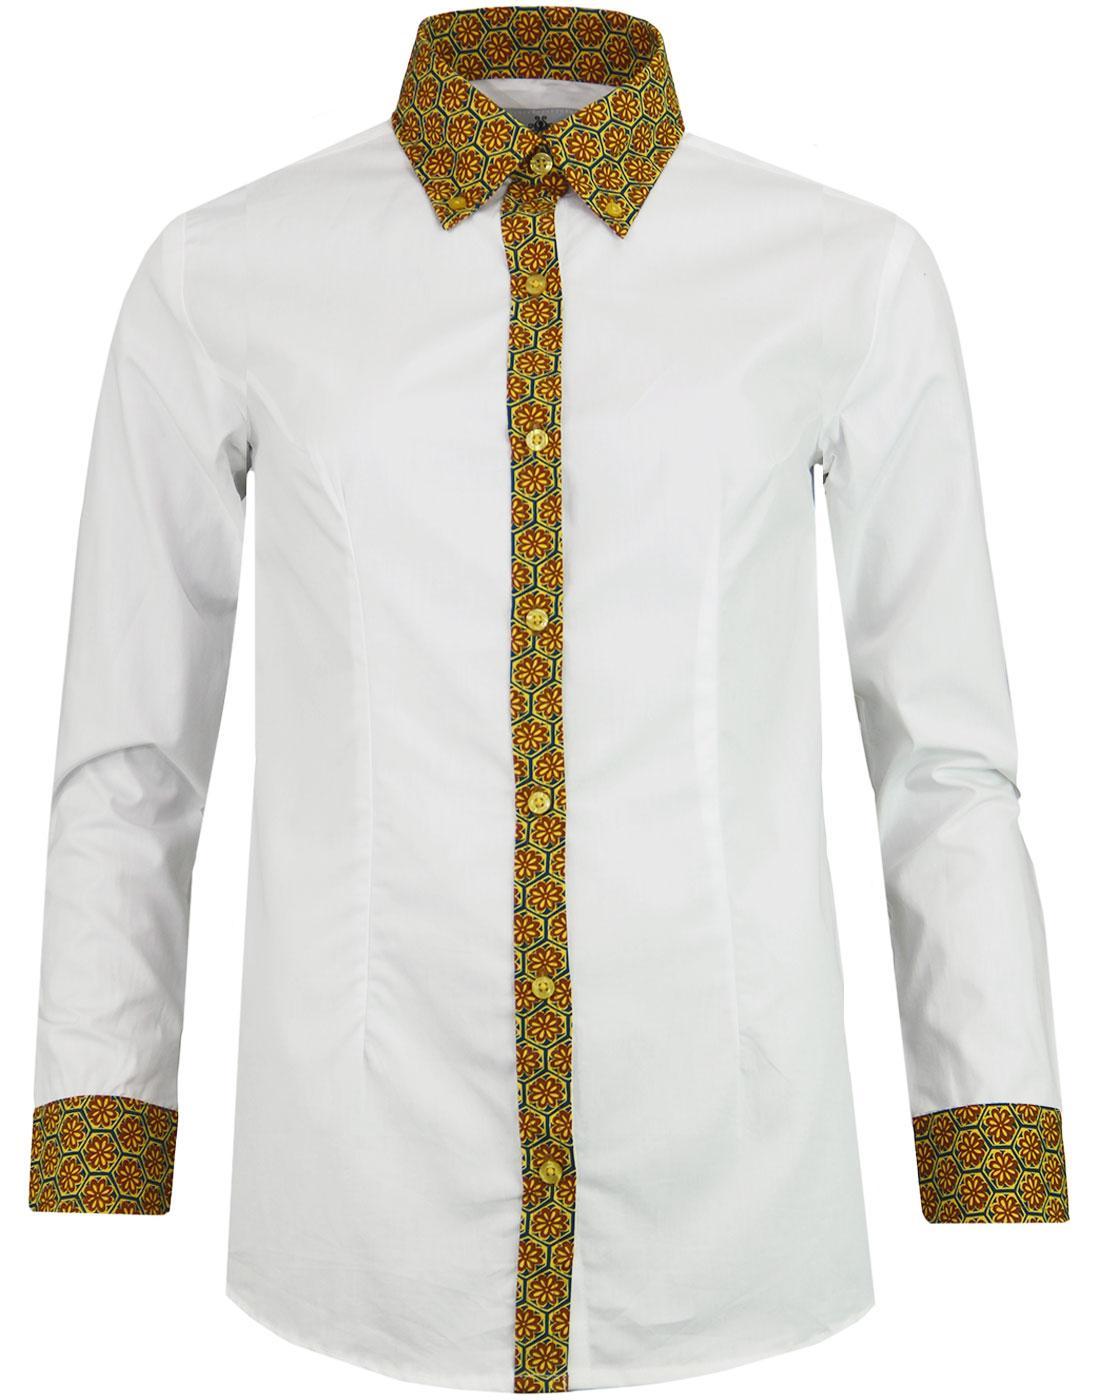 Juniper MADCAP ENGLAND Mod Floral Trim Shirt TEAL